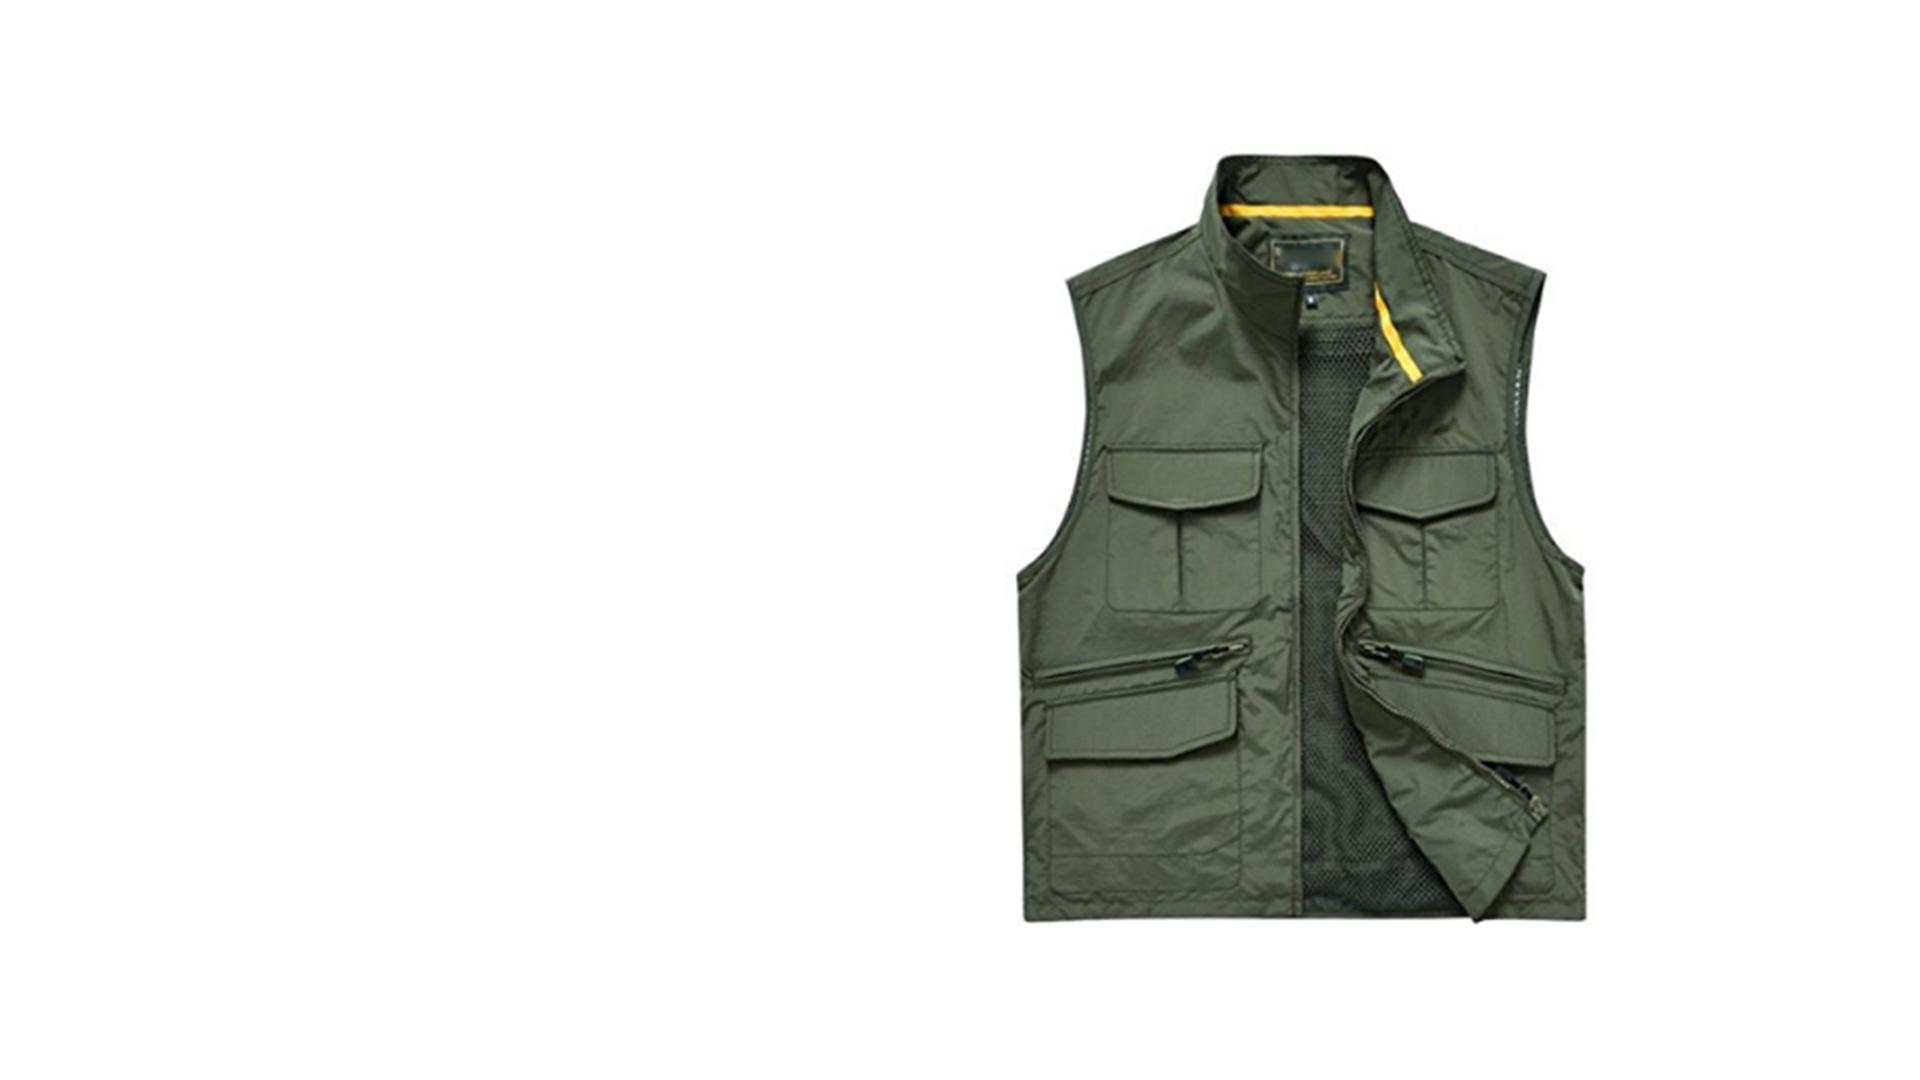 Multi Pocket Vest - Khalid - Young Dumb & Broke